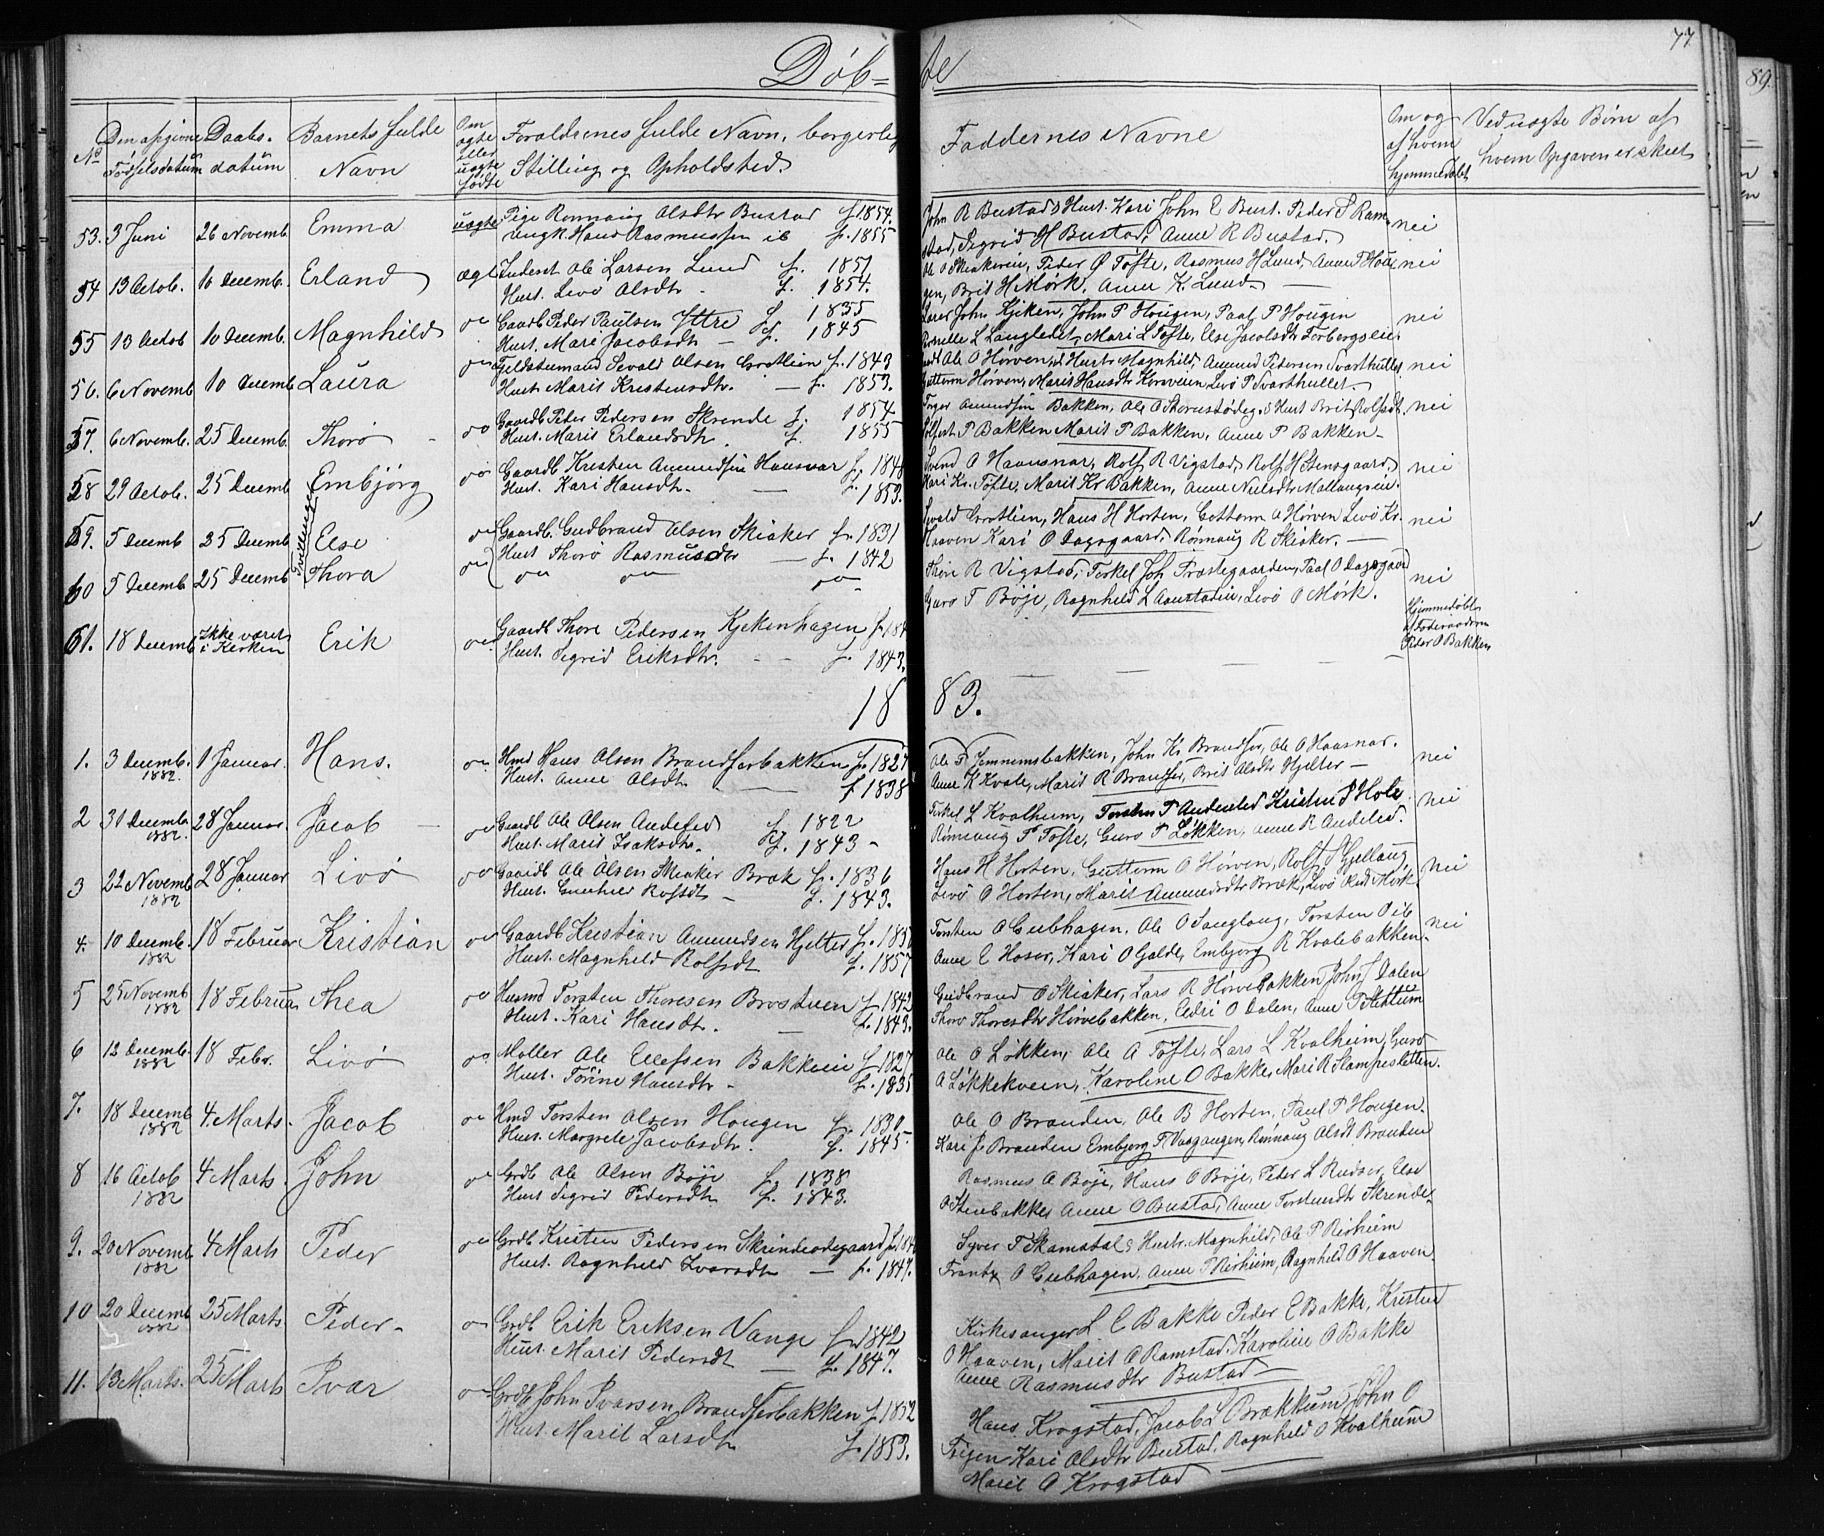 SAH, Skjåk prestekontor, Klokkerbok nr. 1, 1865-1893, s. 77